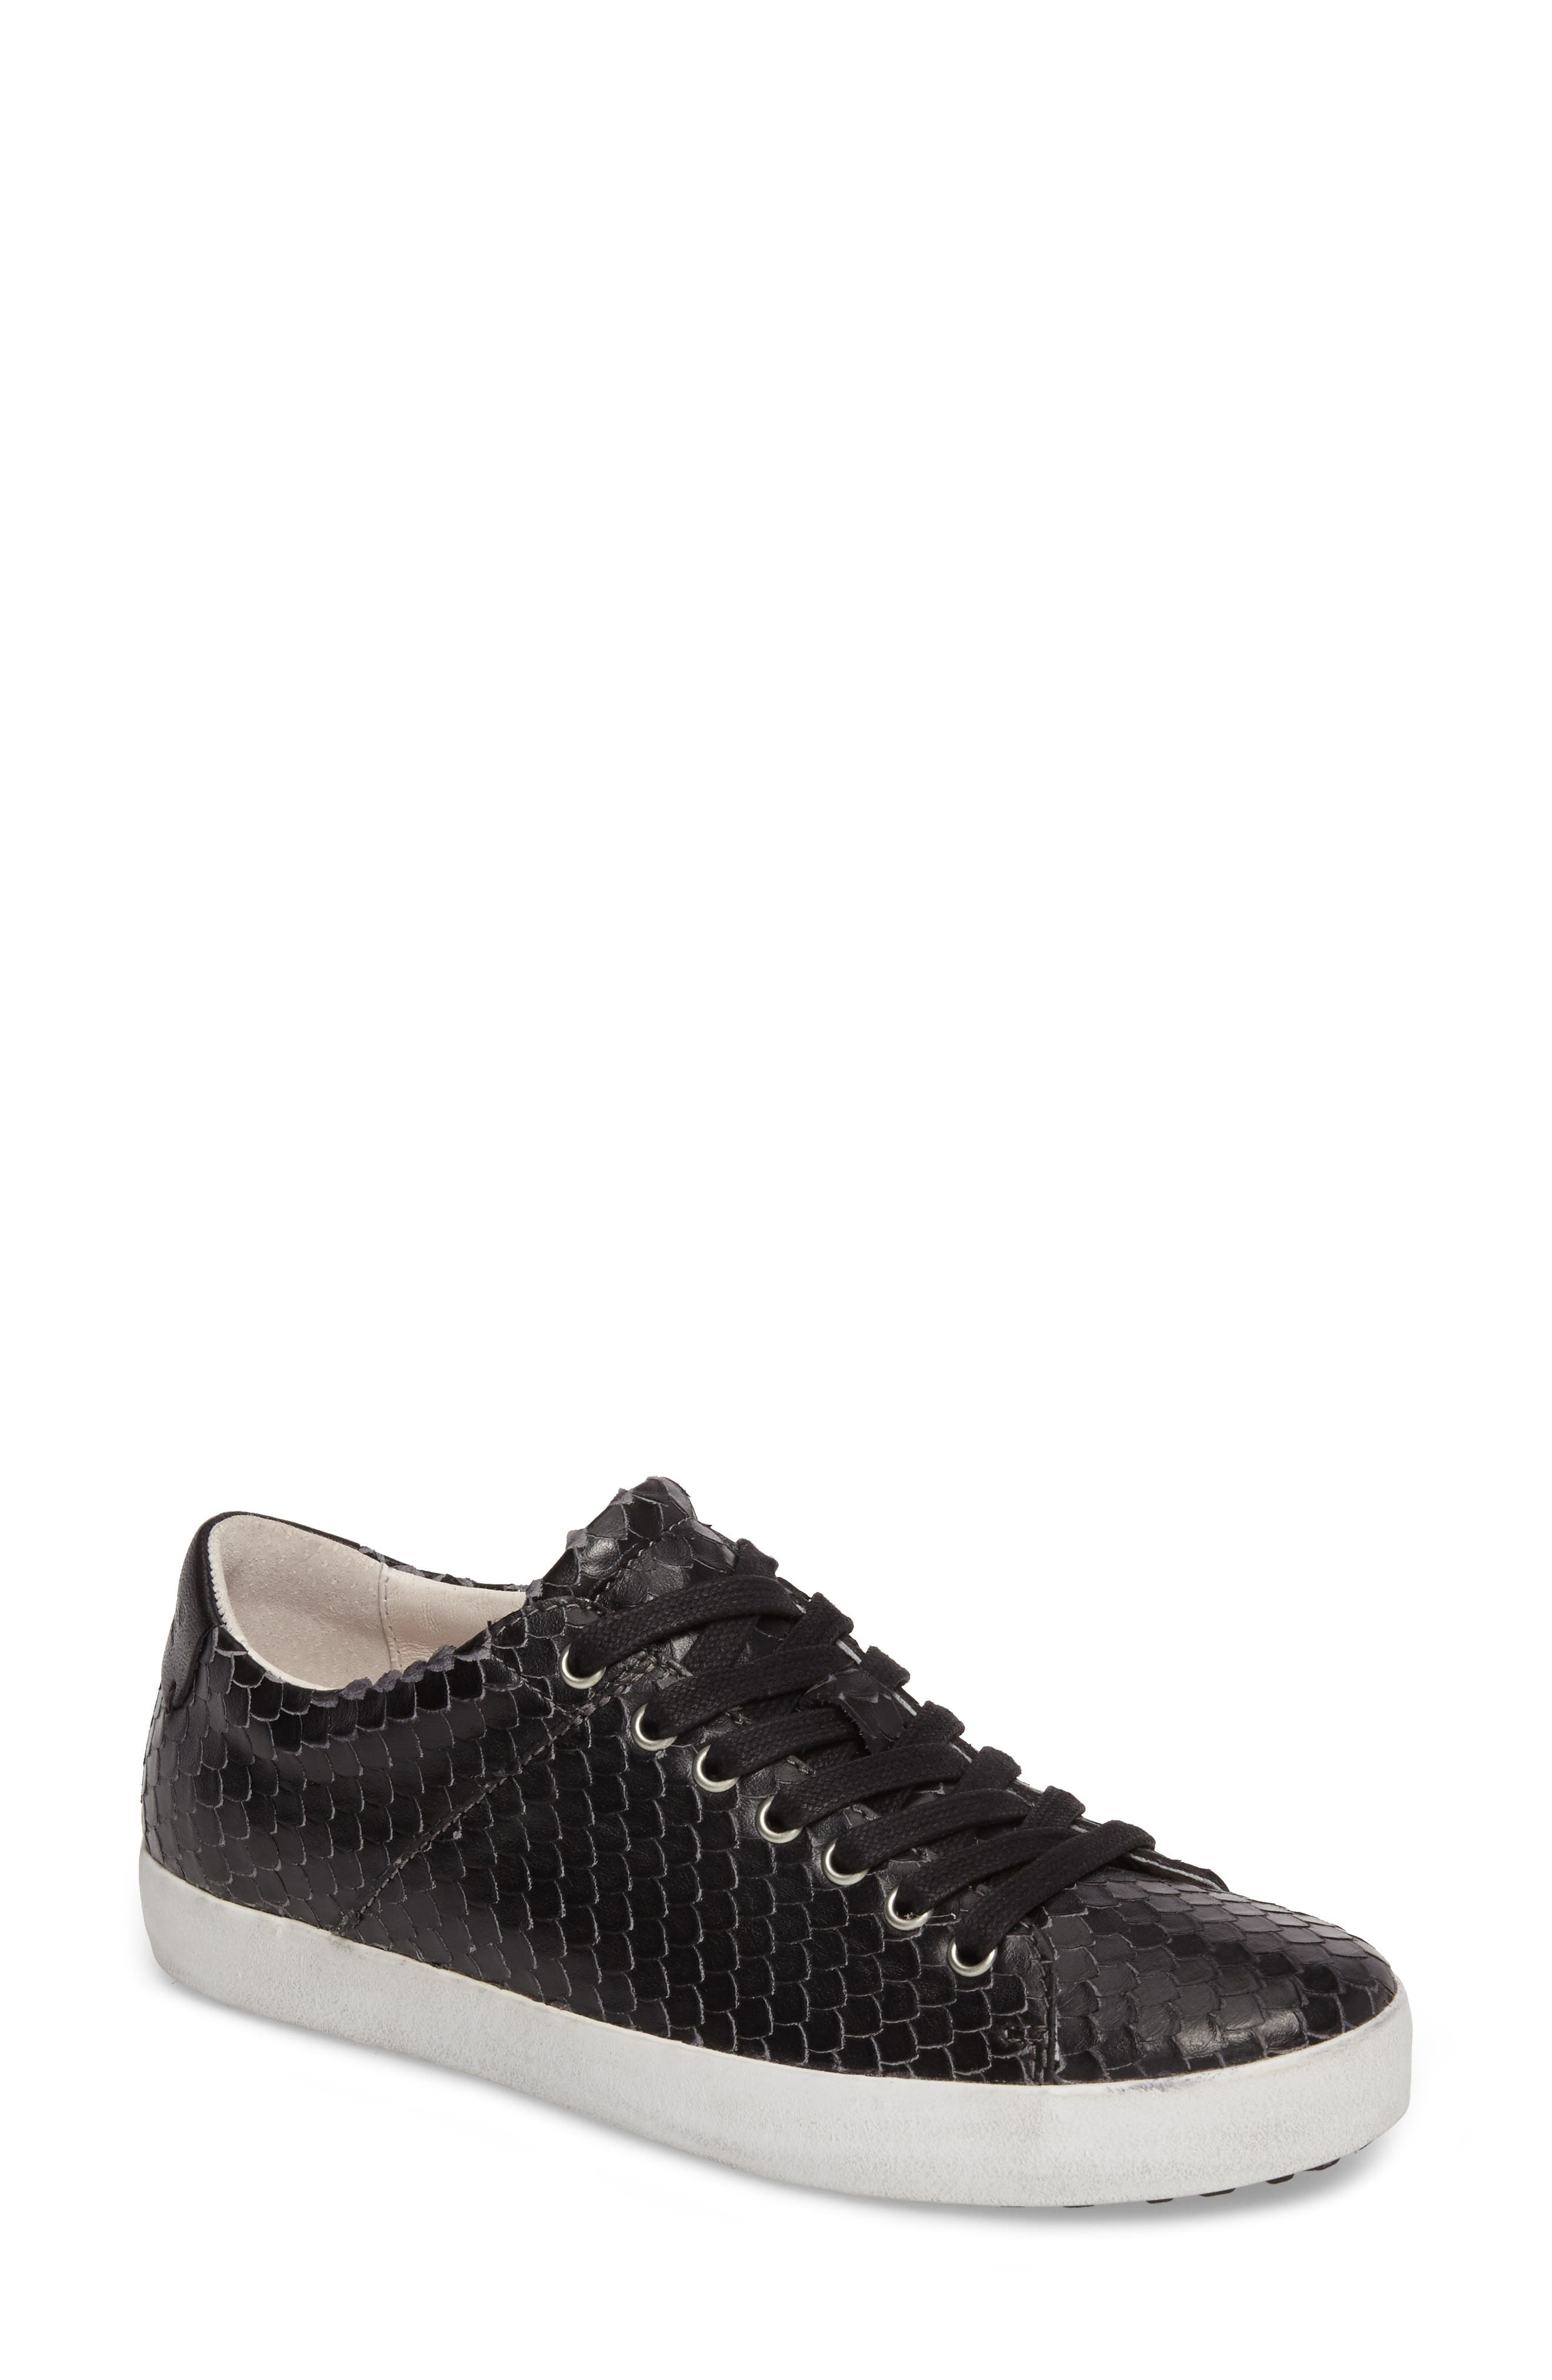 OL25 Sneaker,                             Main thumbnail 1, color,                             BLACK LEATHER